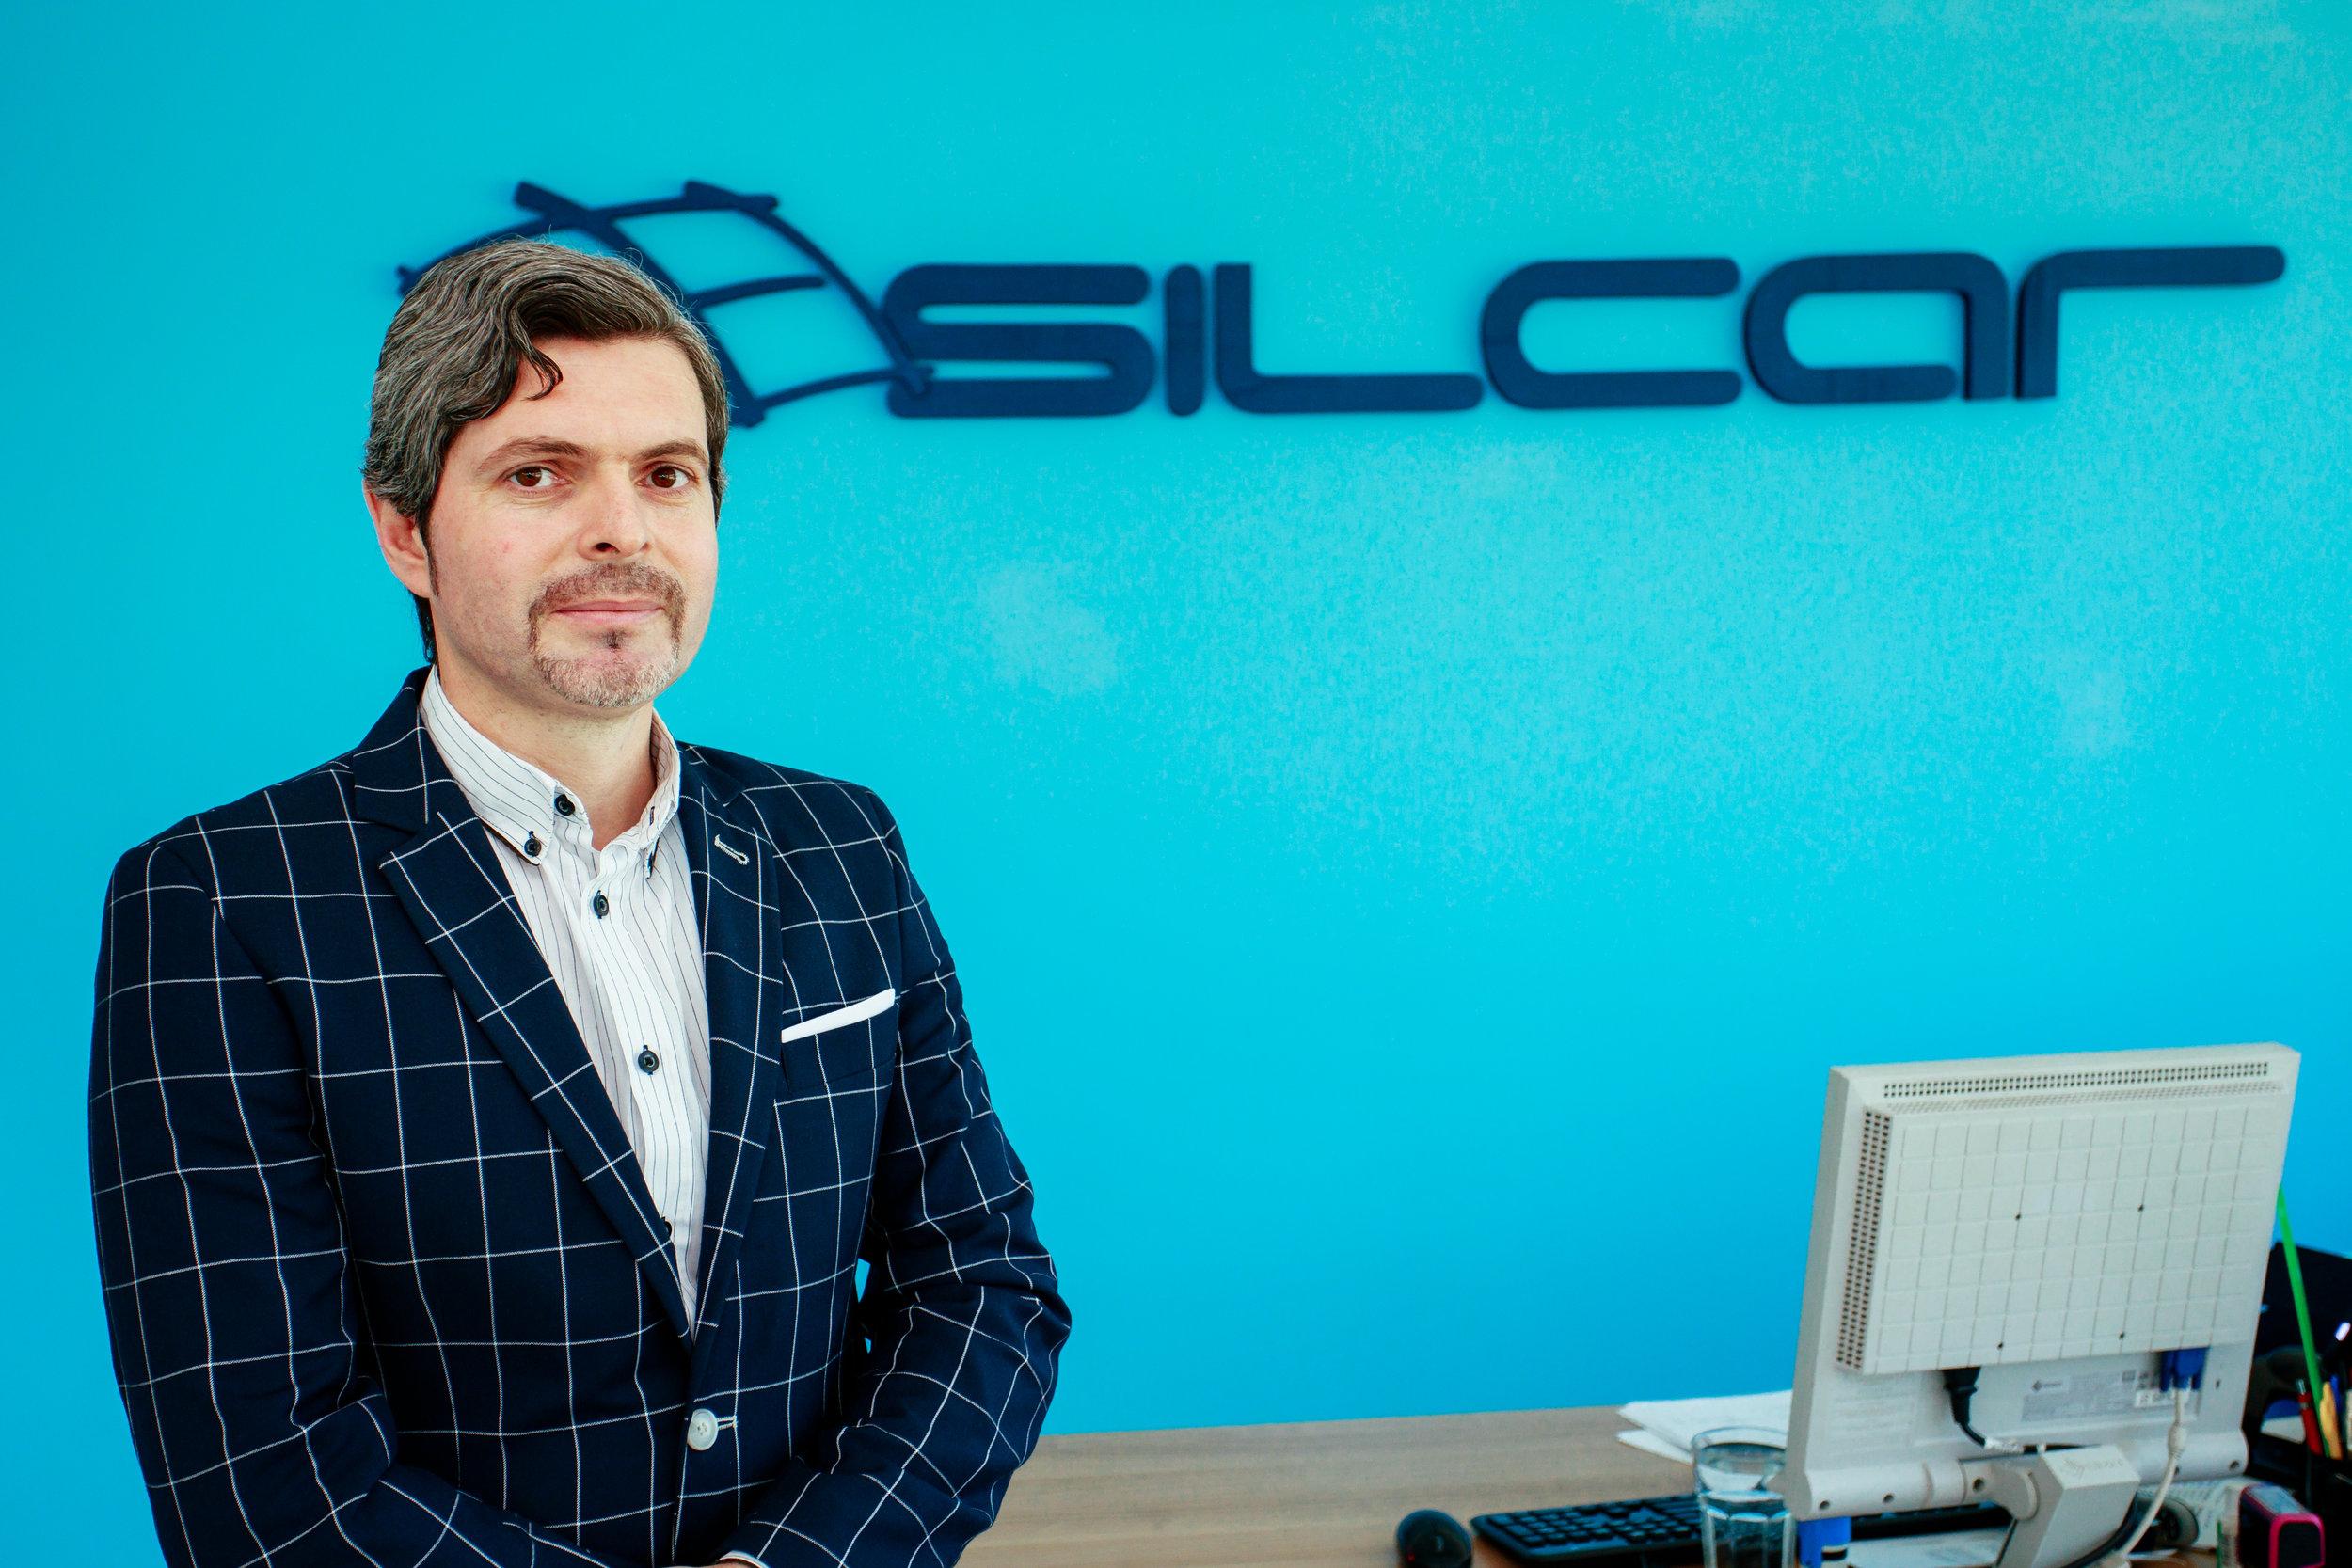 Ovidiu Caraba, General Manager of Silcar